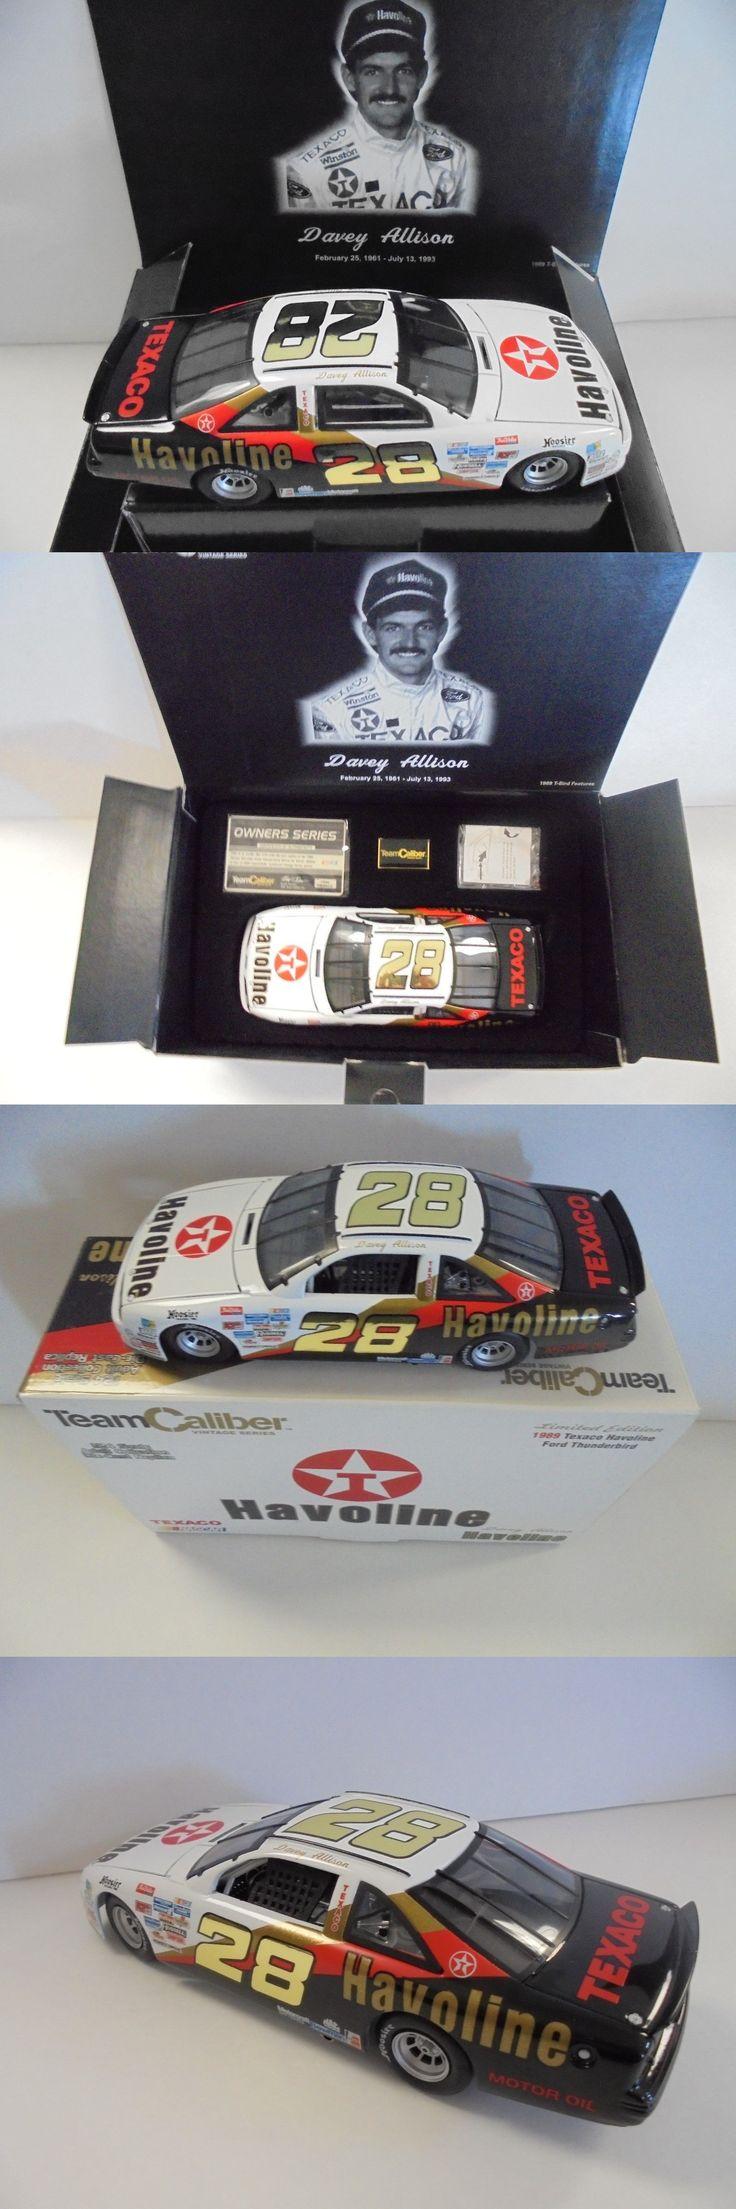 Other Diecast Racing Cars 45354: Davey Allison #28 Texaco Havoline 1989 Ford Thunderbird 1 24Th Nascar Diecast Mm -> BUY IT NOW ONLY: $259.97 on eBay!